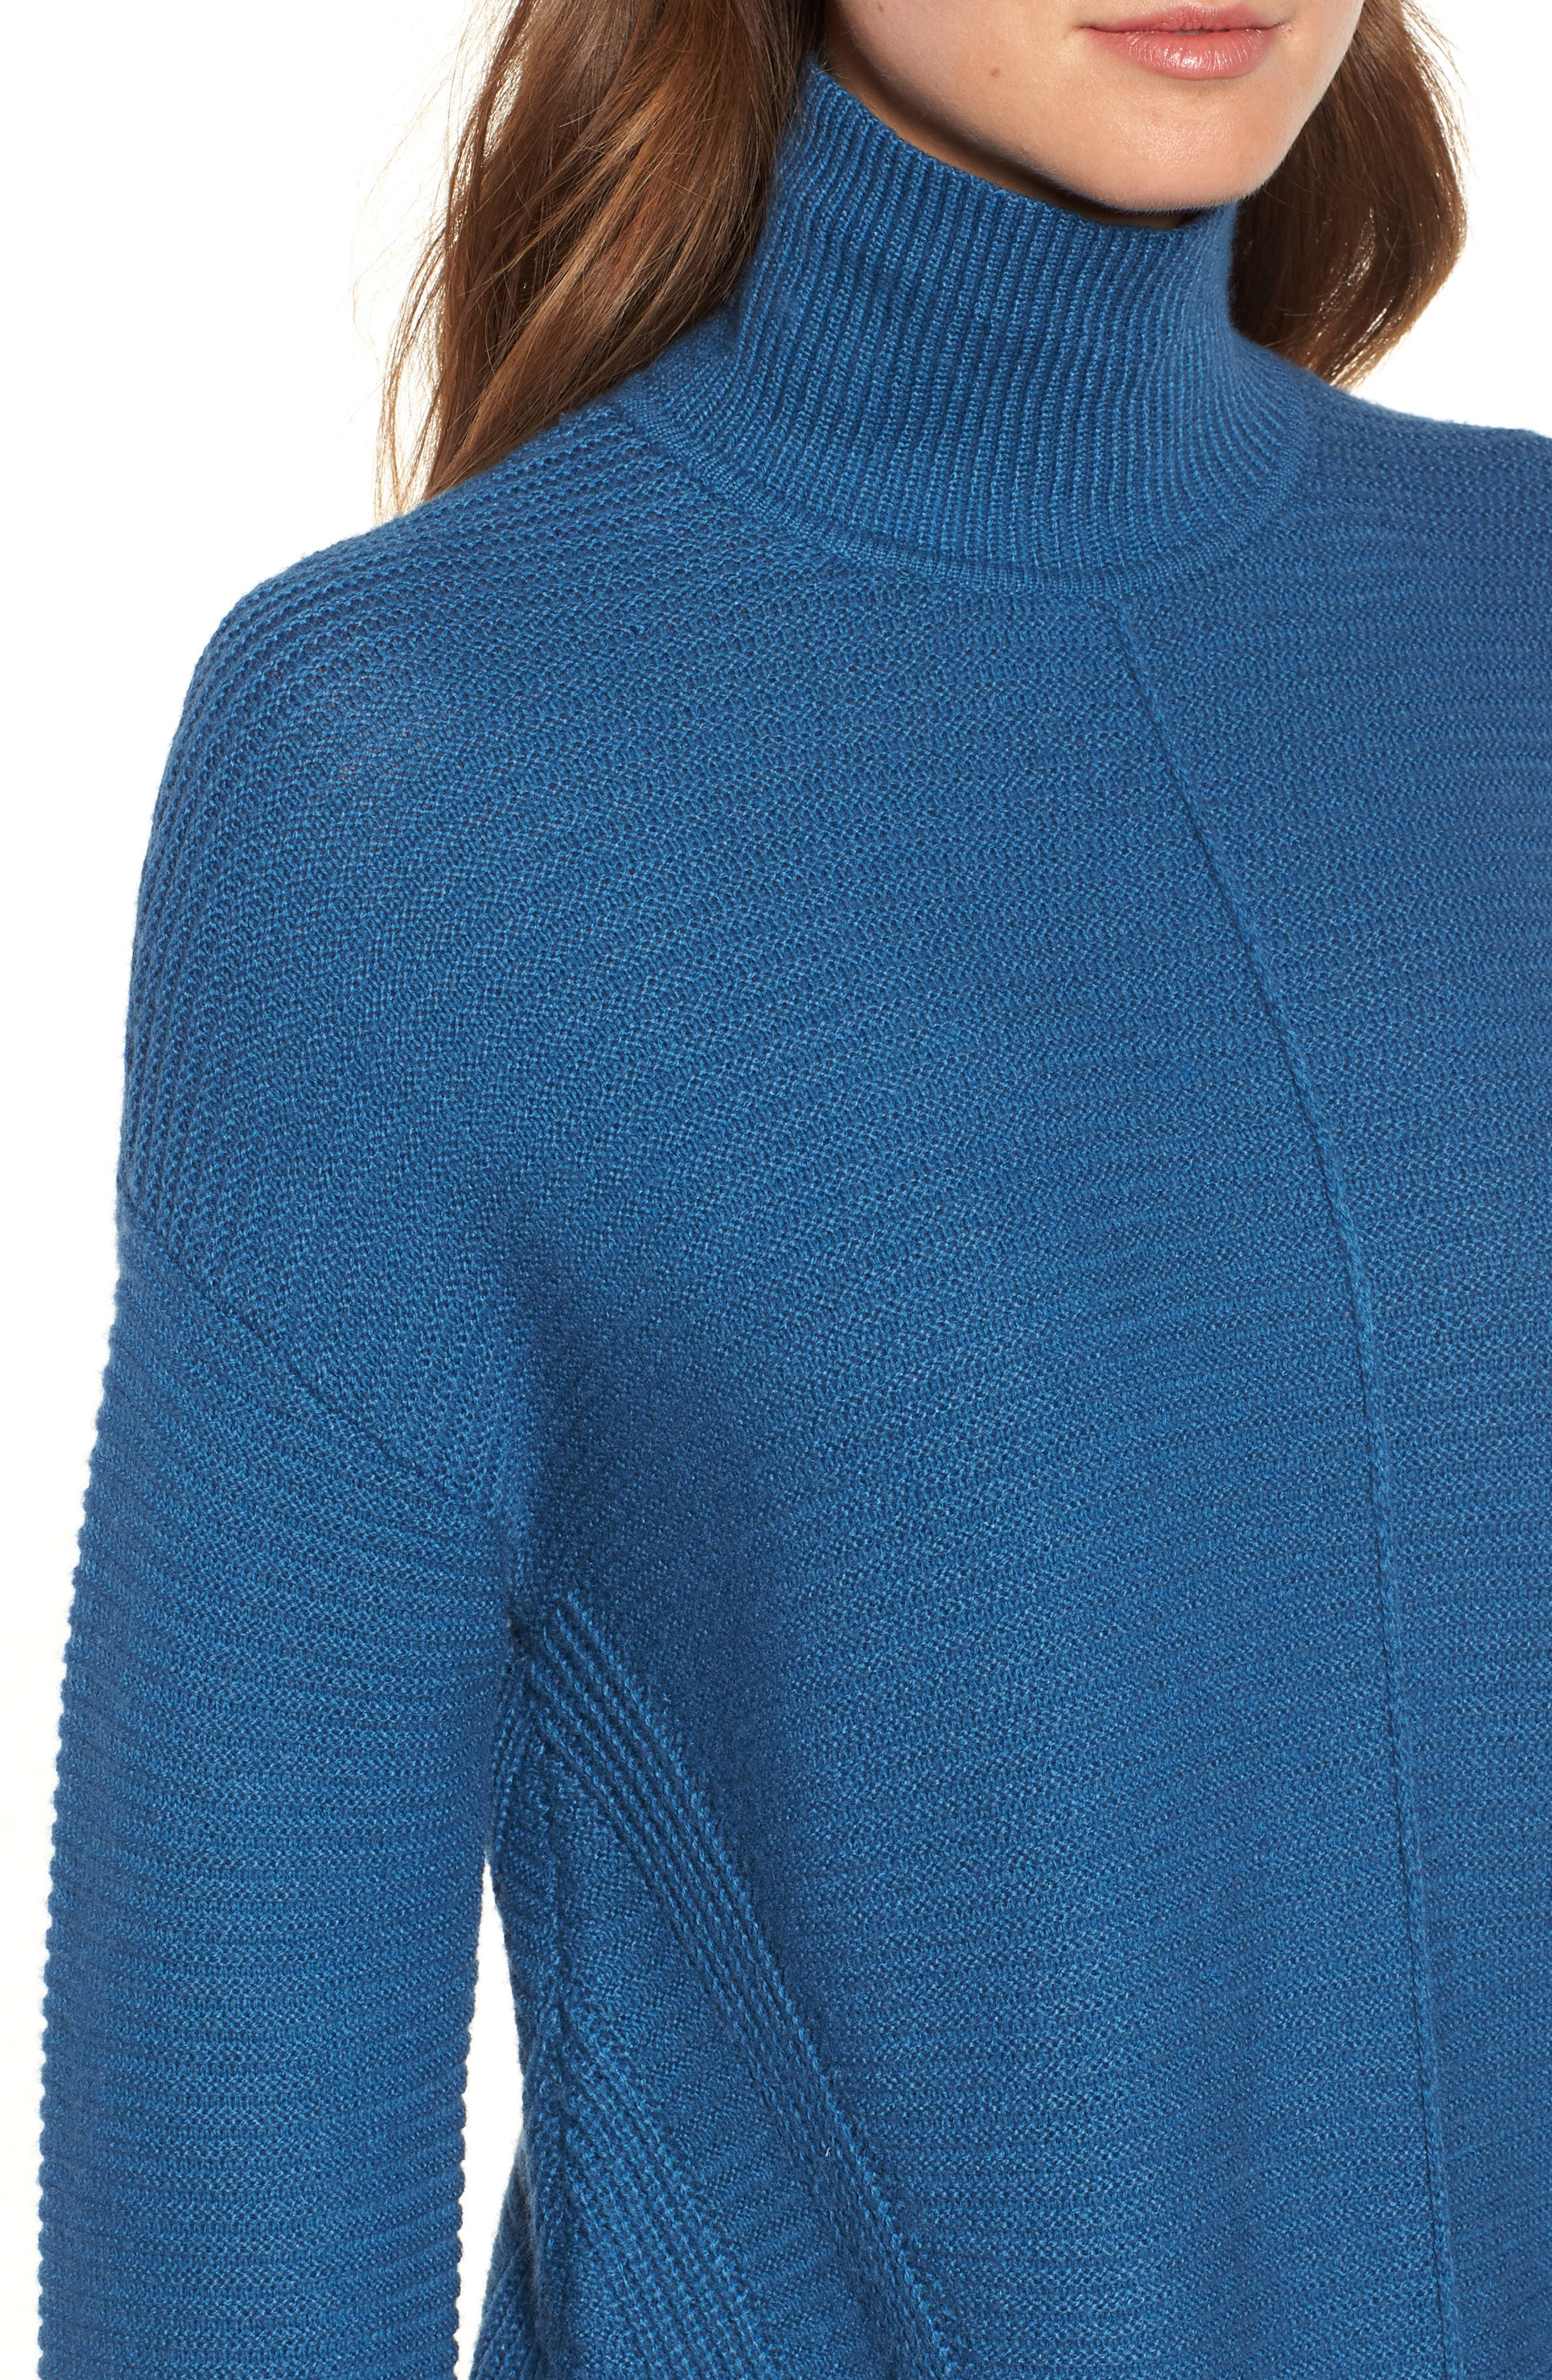 Ribbed Turtleneck Tunic Sweater,                             Alternate thumbnail 4, color,                             BLUE DARK